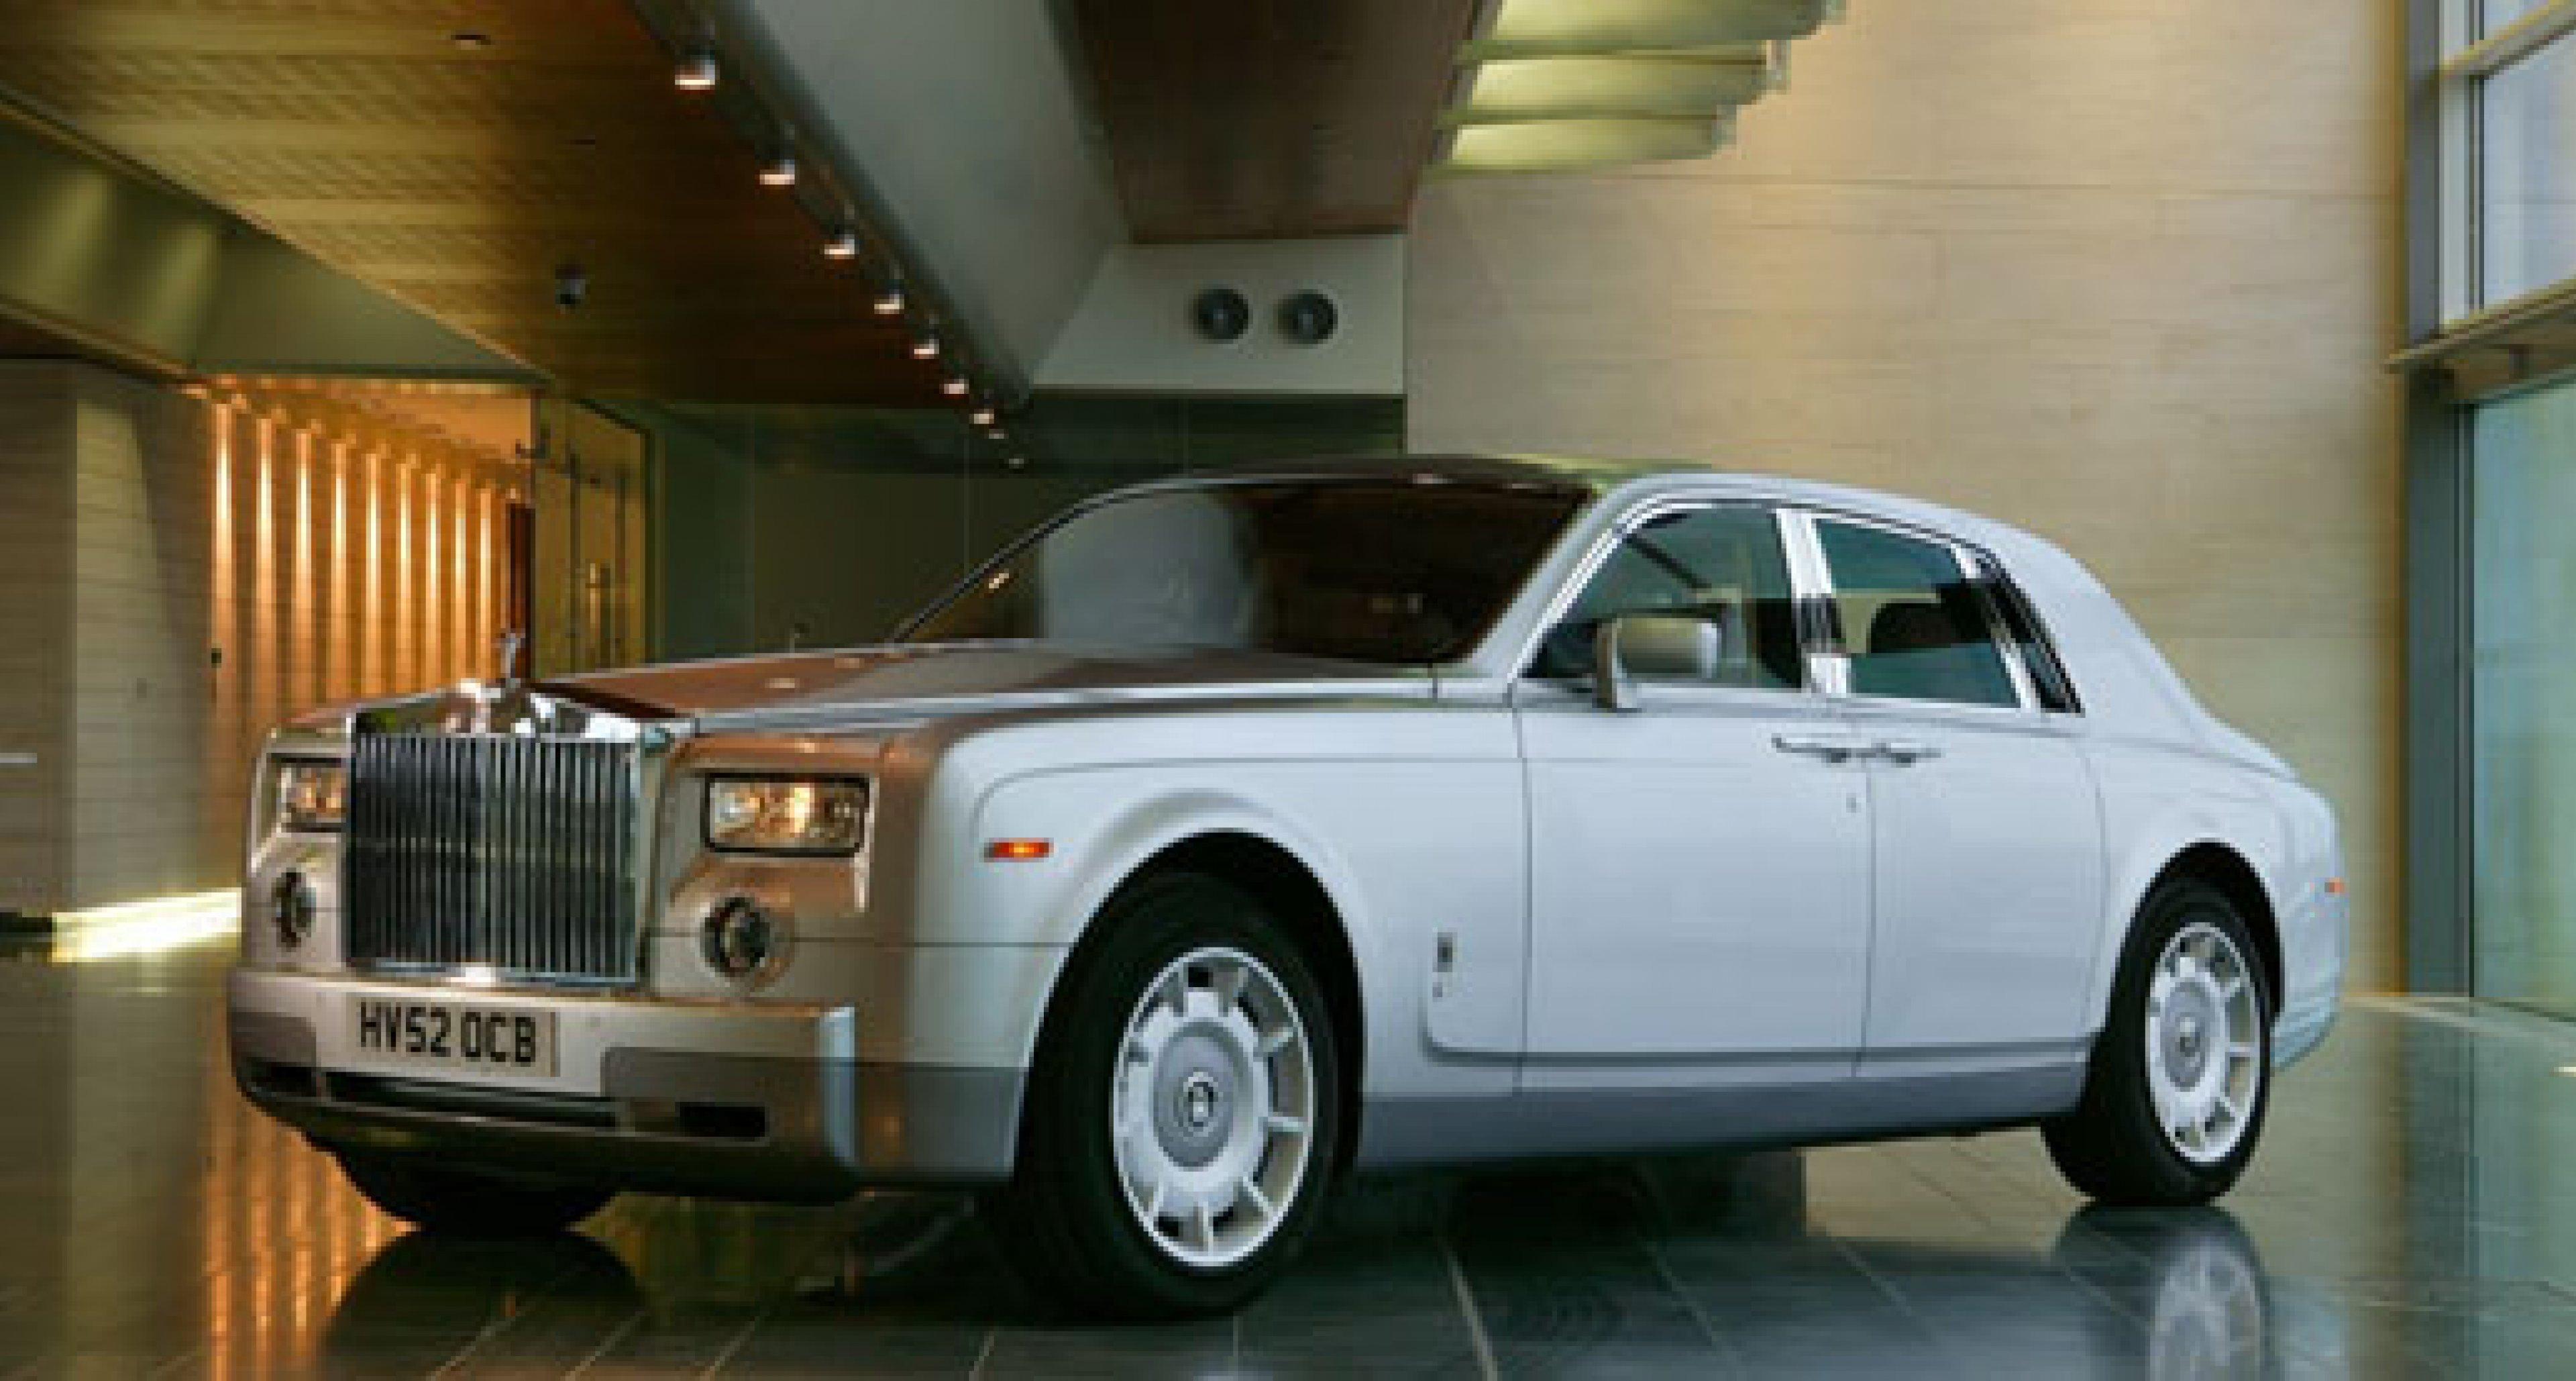 Rolls-Royce - New Phantom celebrates first birthday in Detroit